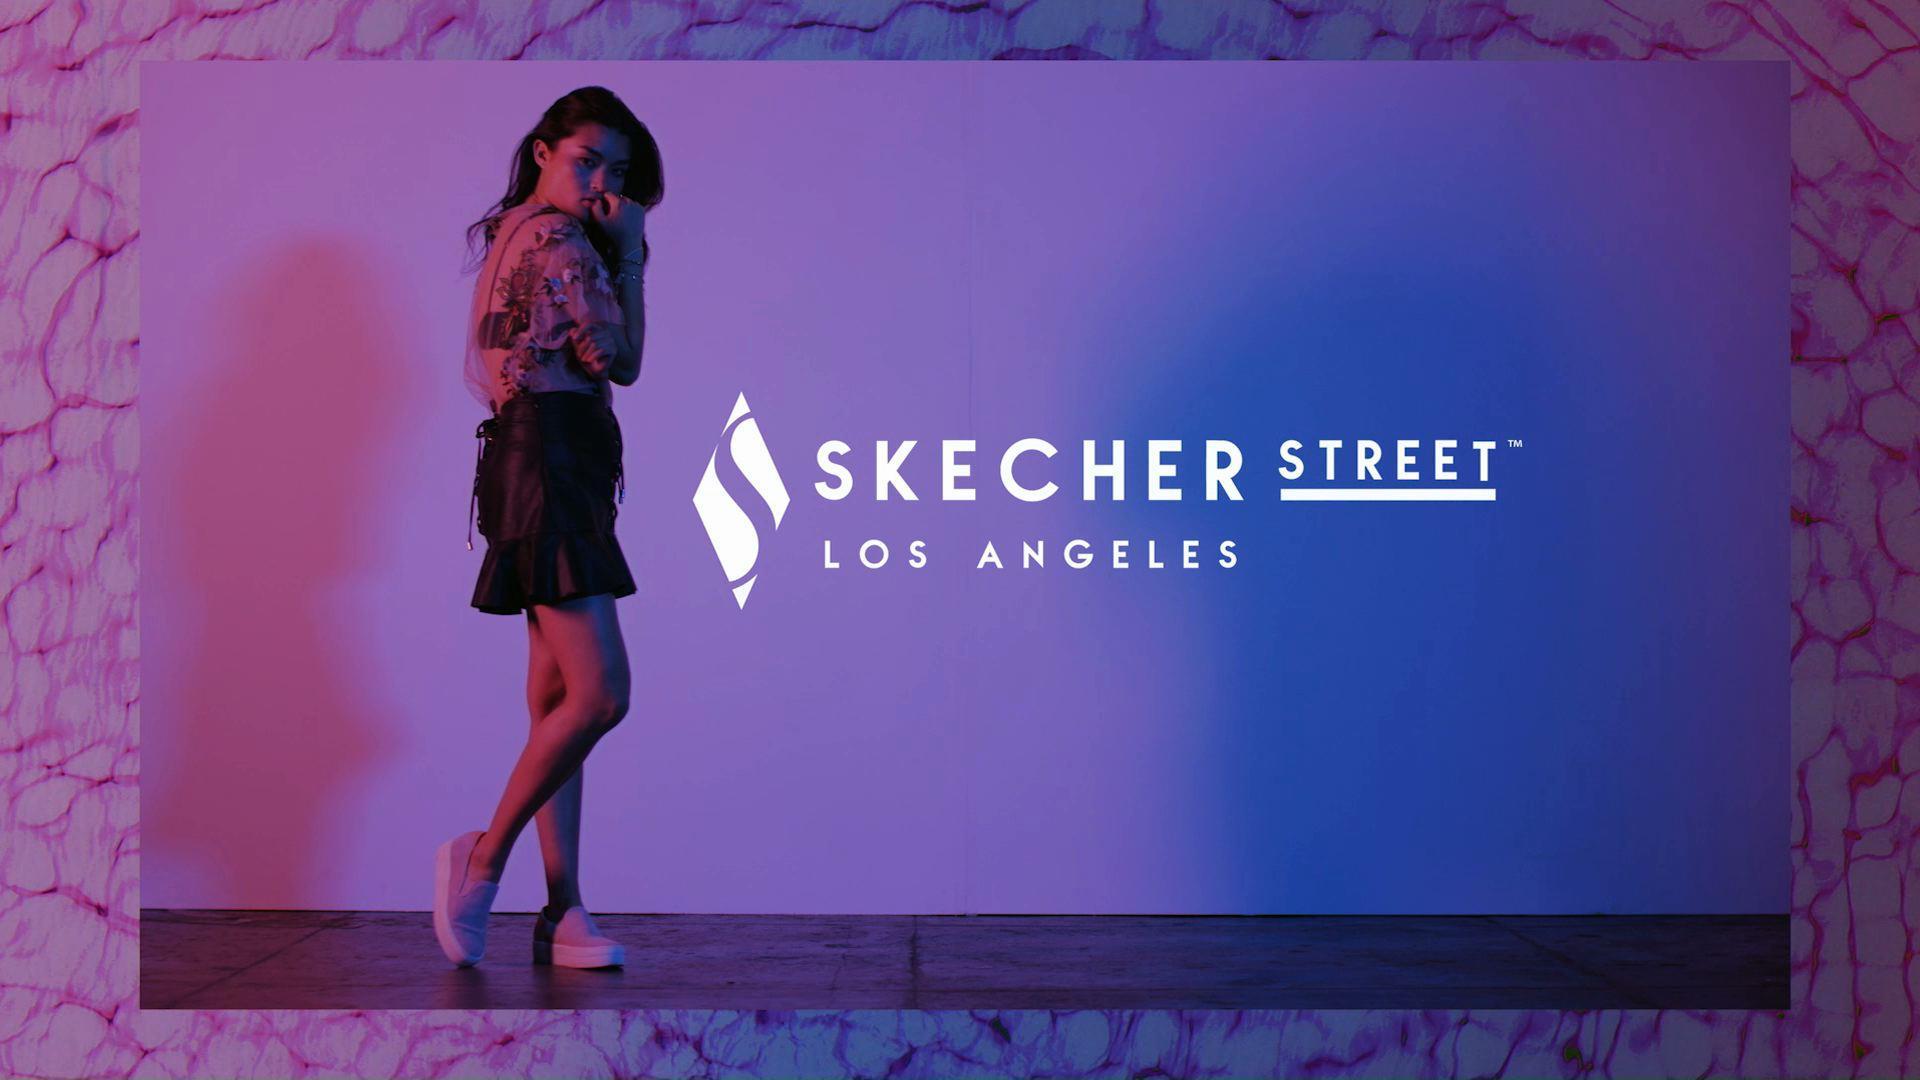 Skecher Street